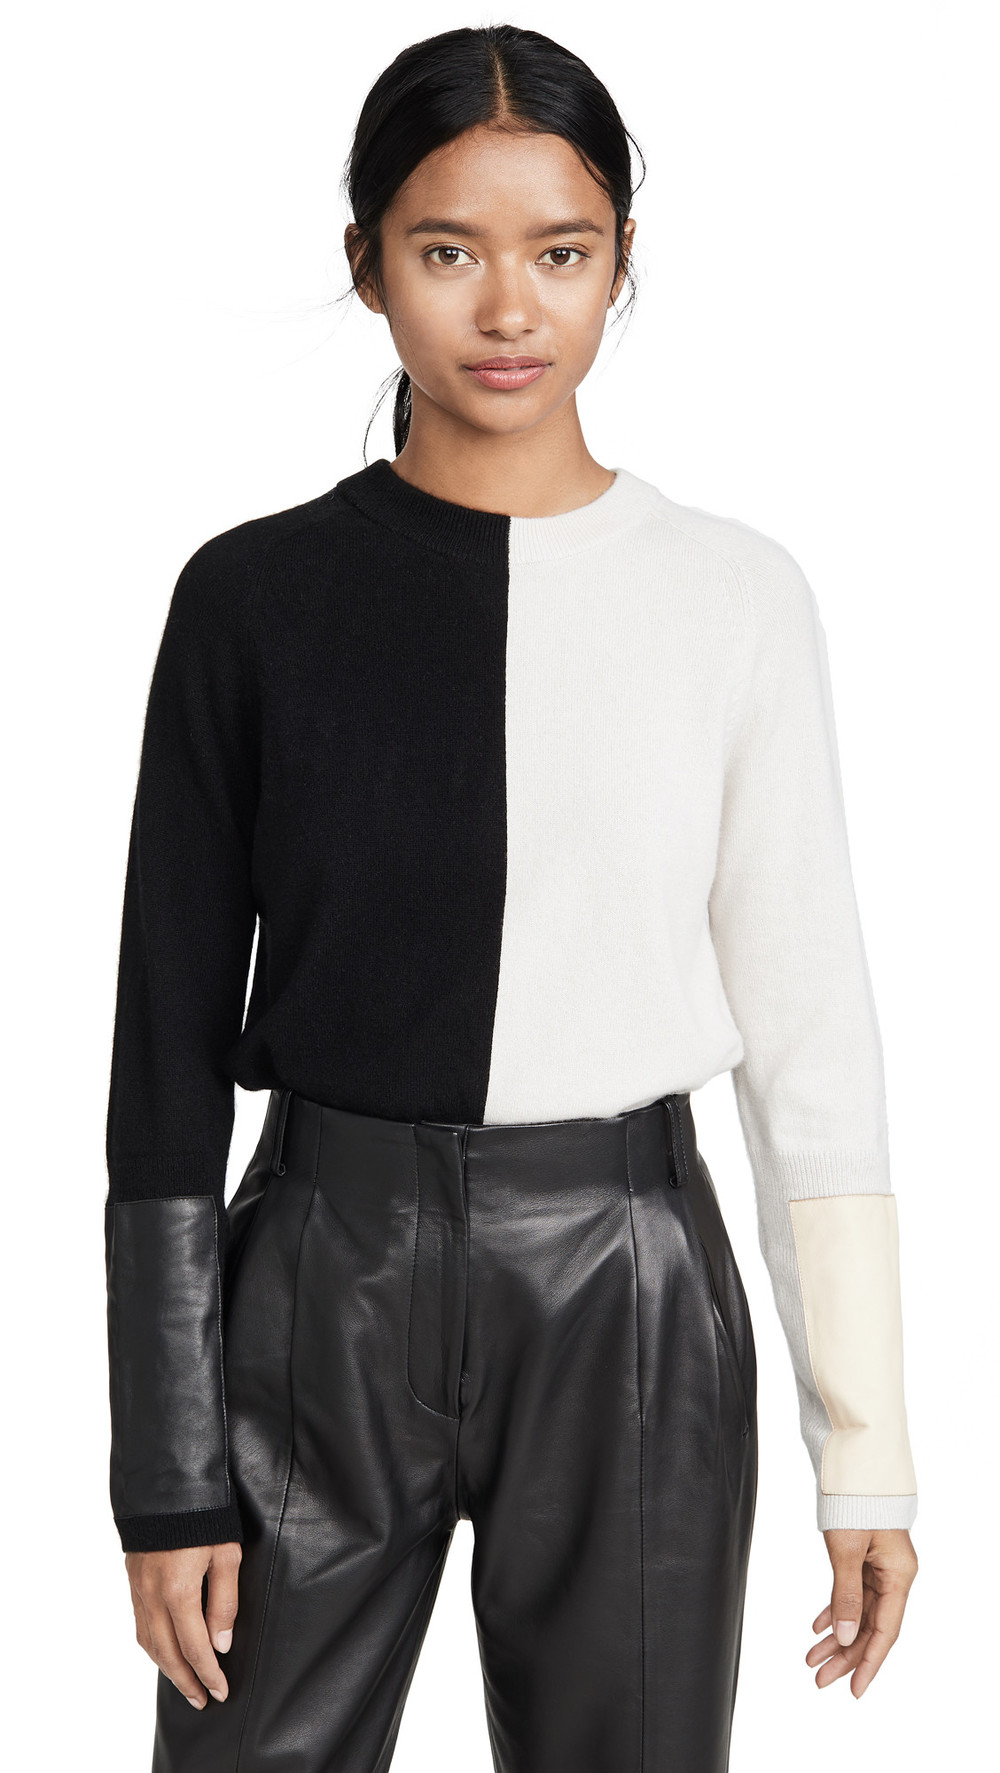 VEDA Gus Cashmere Sweater in black / cream